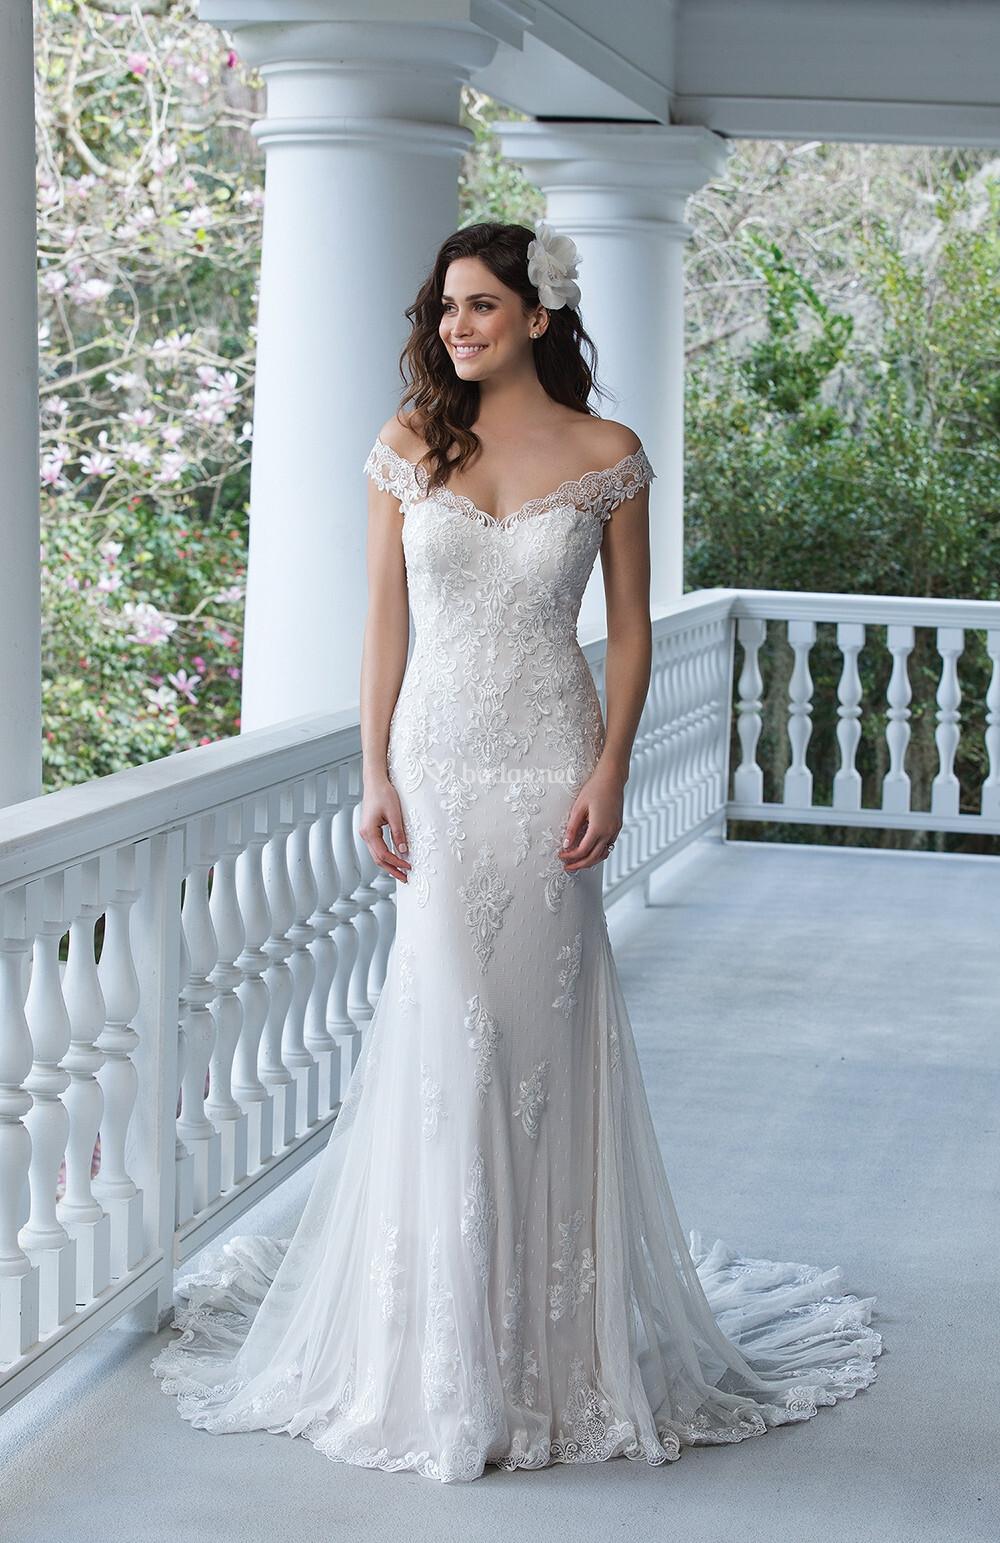 Vestidos de Novia de Sincerity Bridal - 2017 - Bodas.net